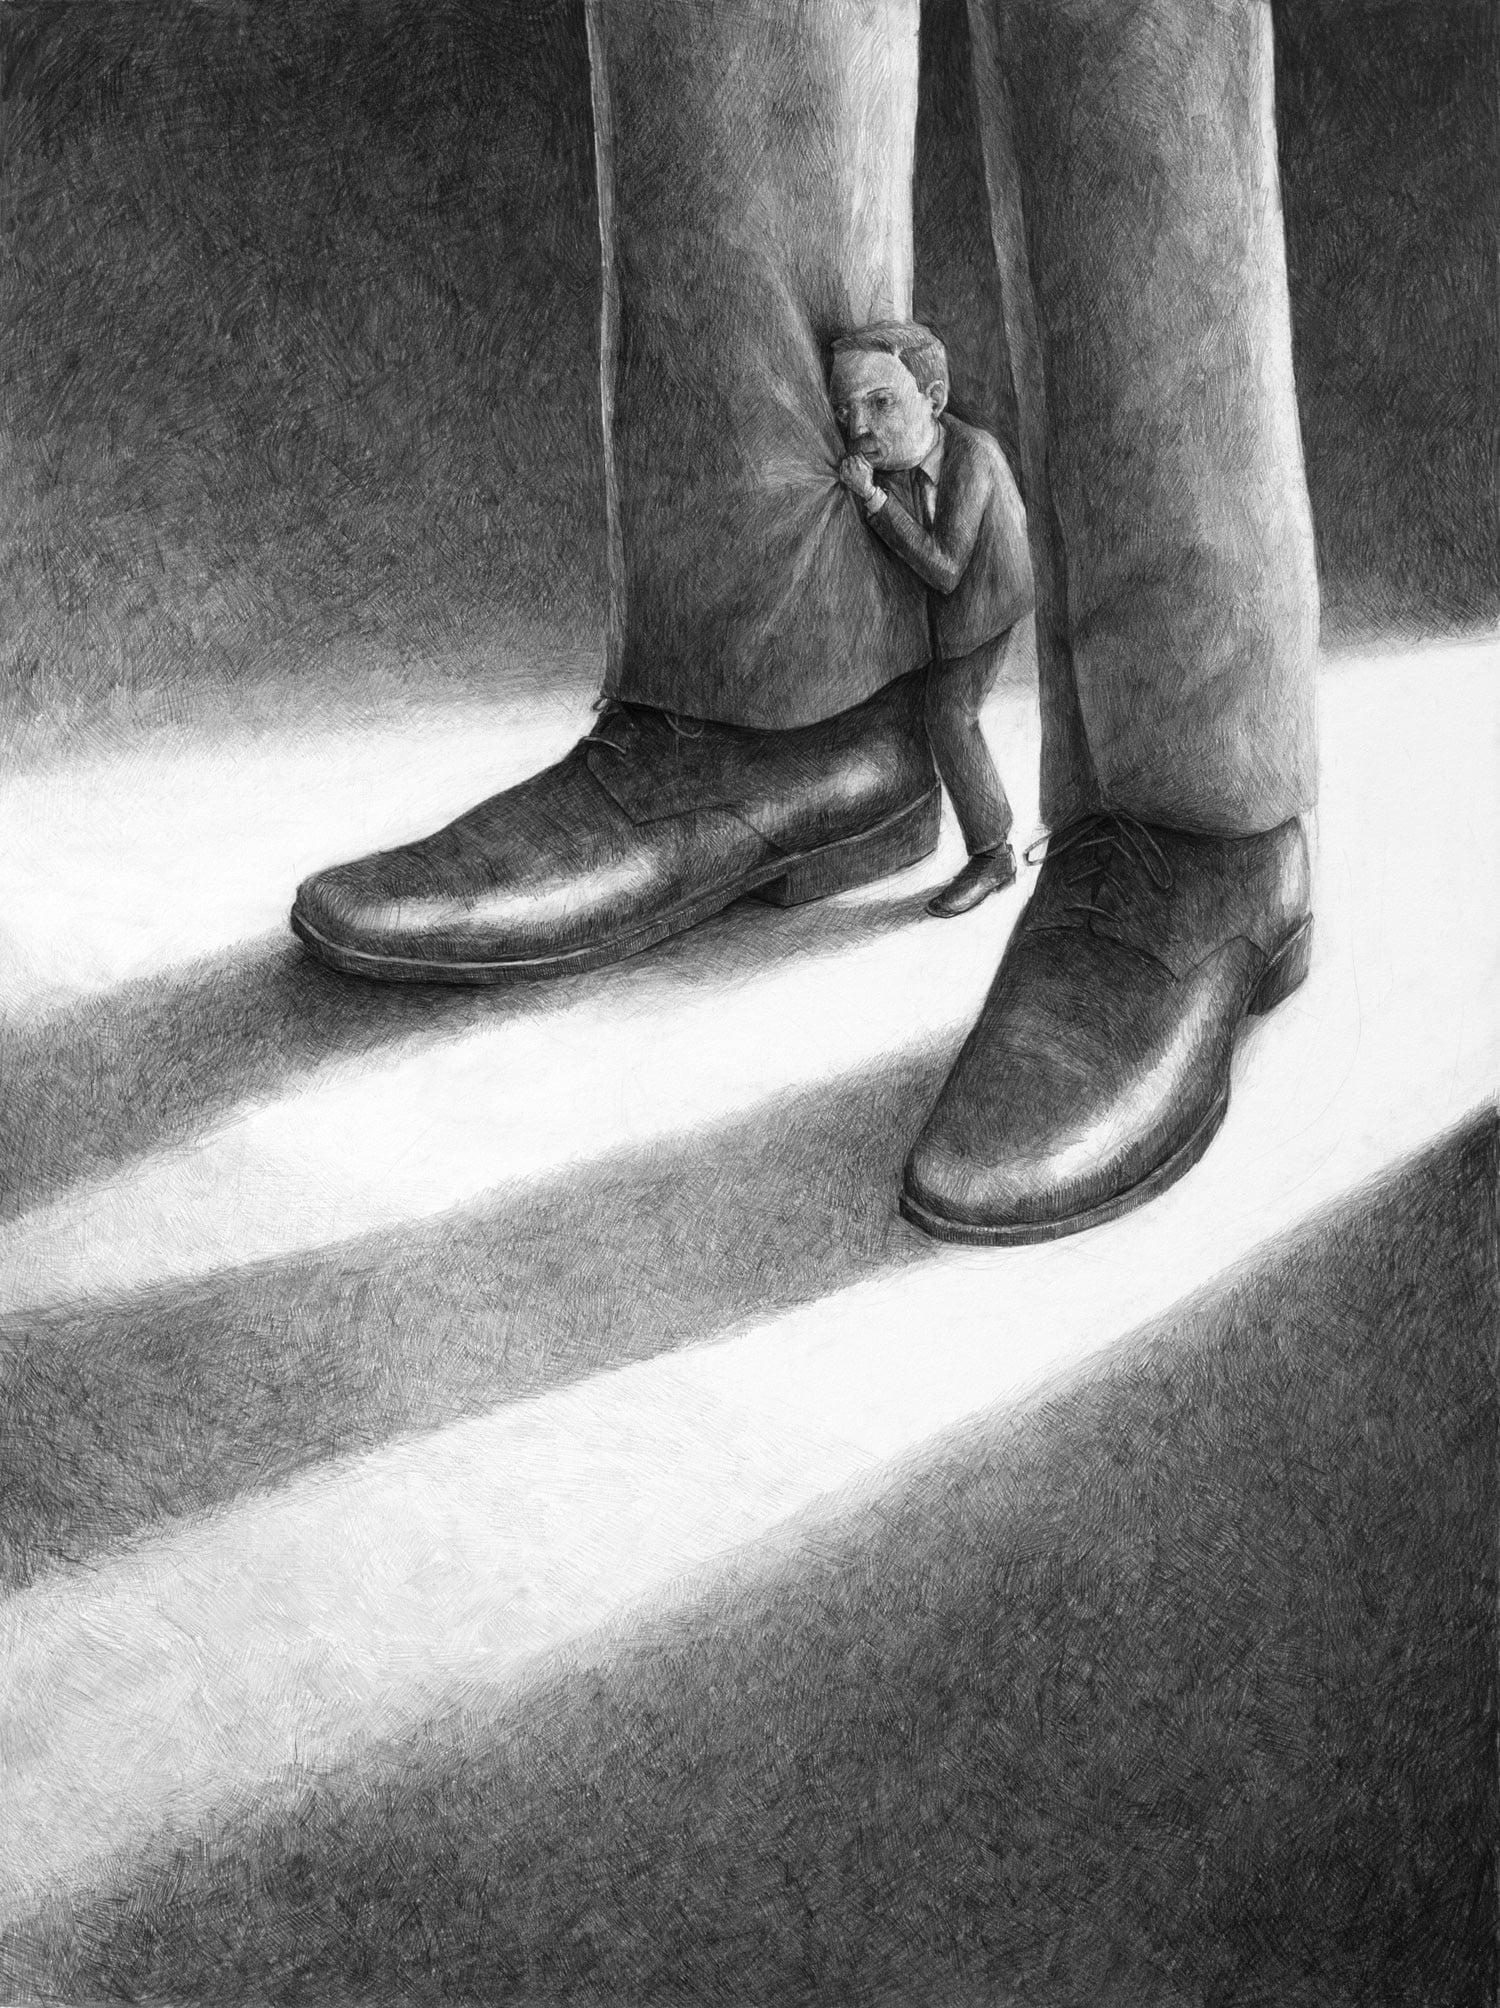 zsaitsits ilustracion fear